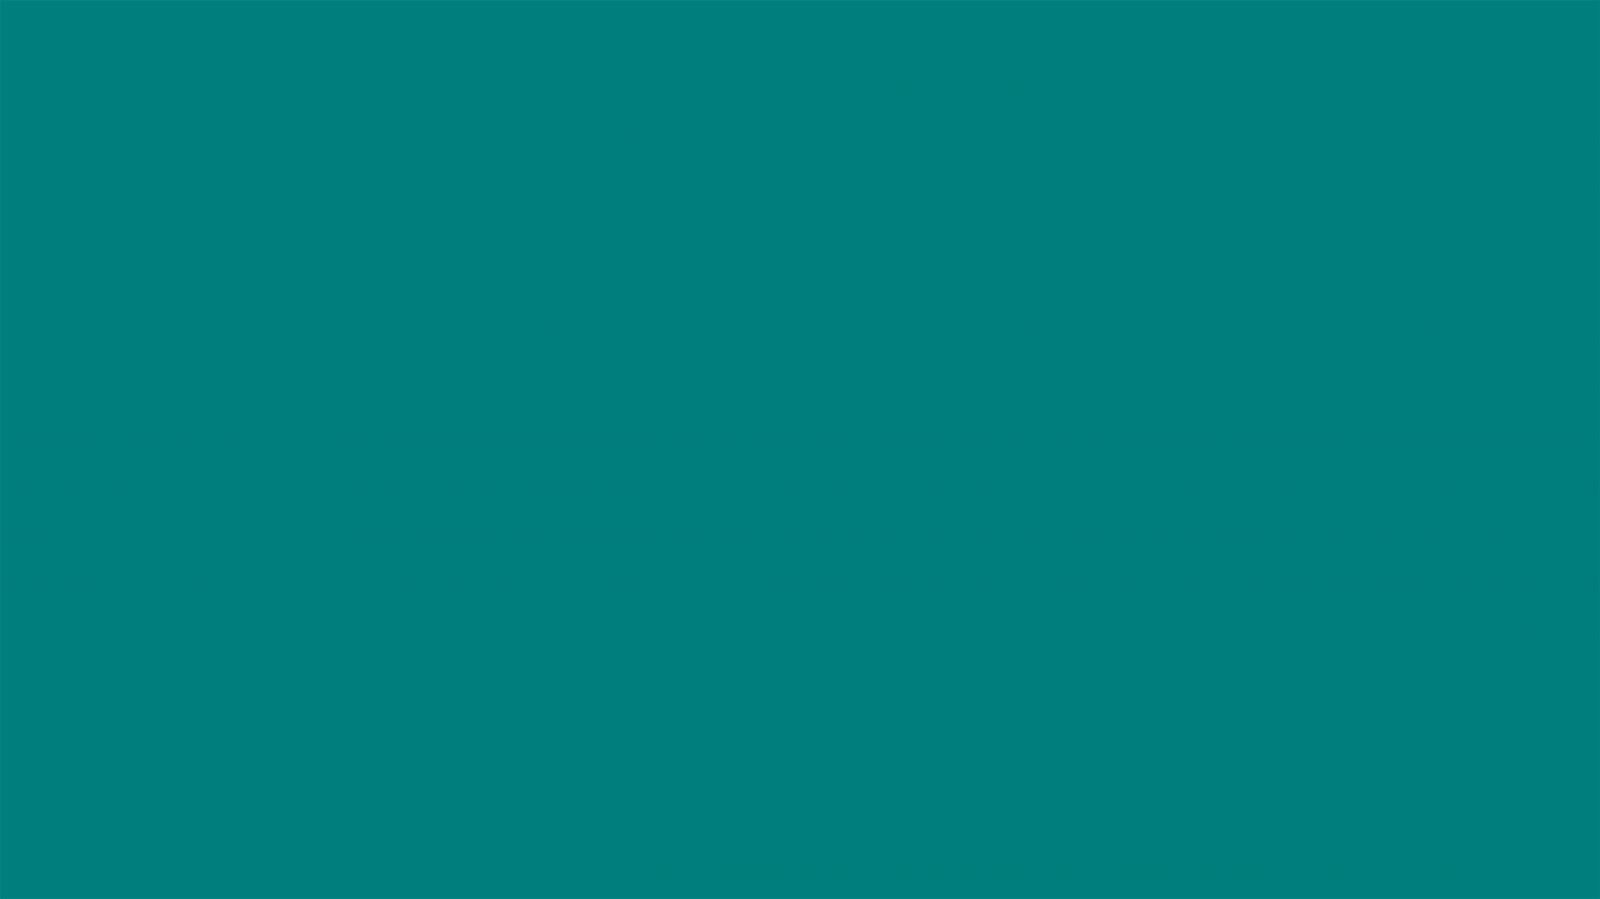 Sfondi Erba Cielo Testo Verde Blu Modello Turchese Tinta